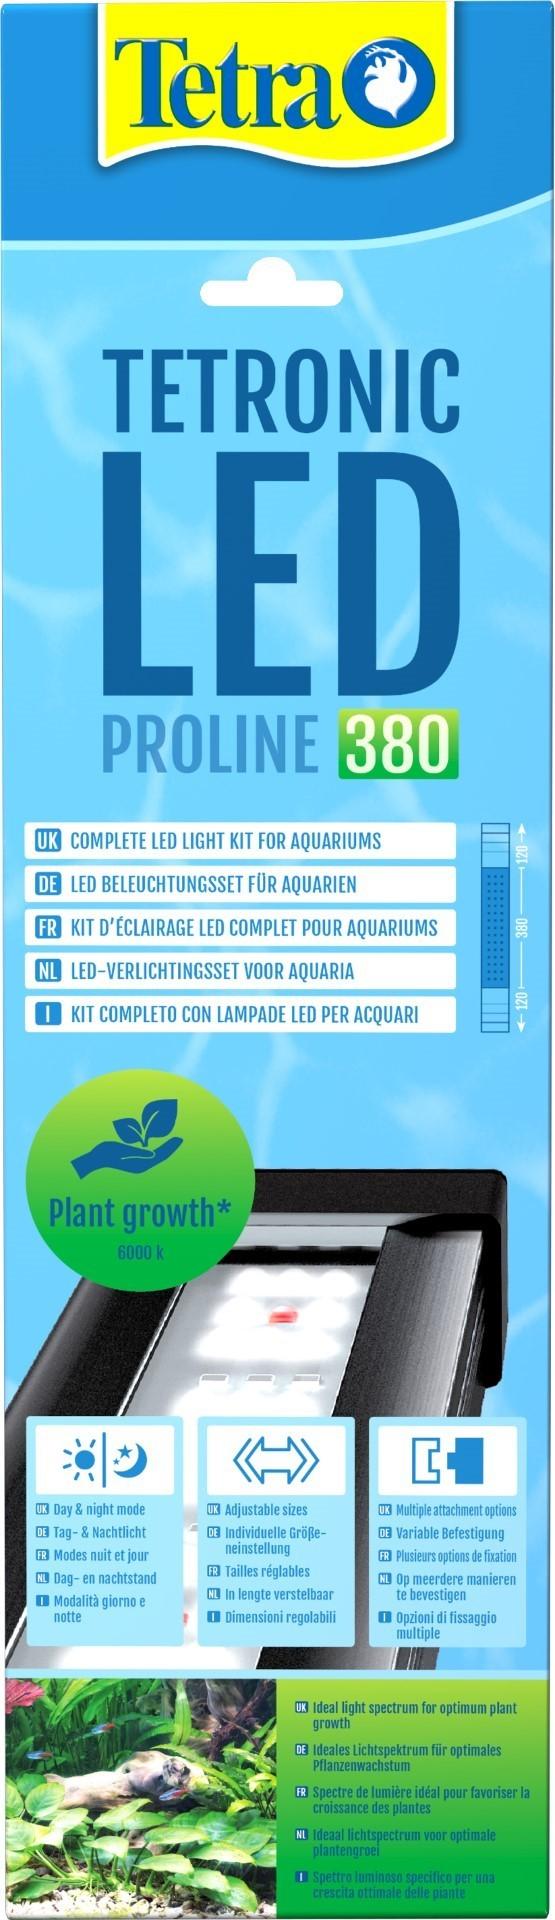 Tetra Tetronic LED Proline 380